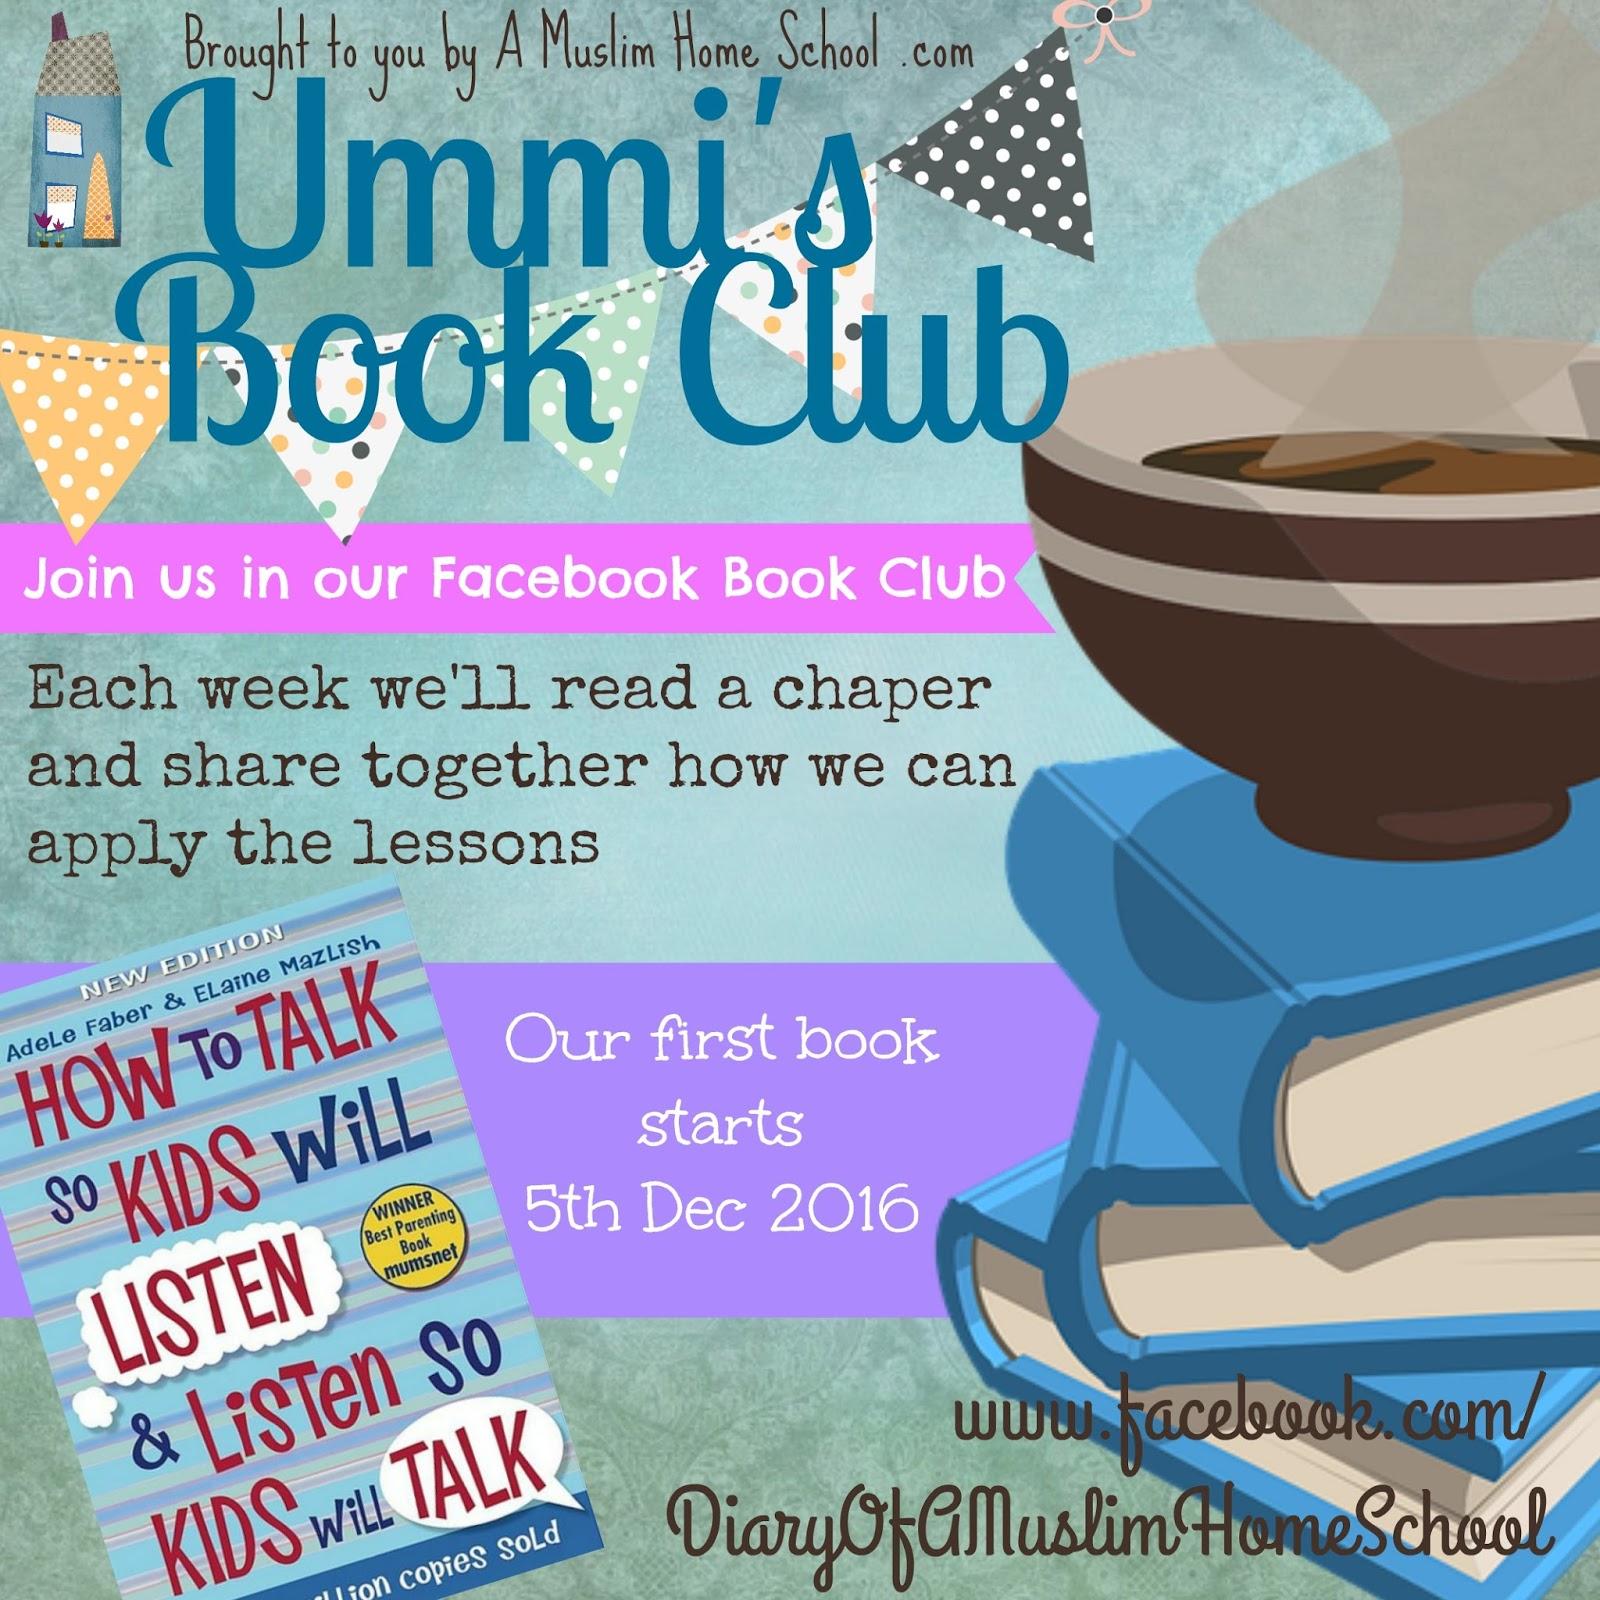 a muslim homeschool: online book club!